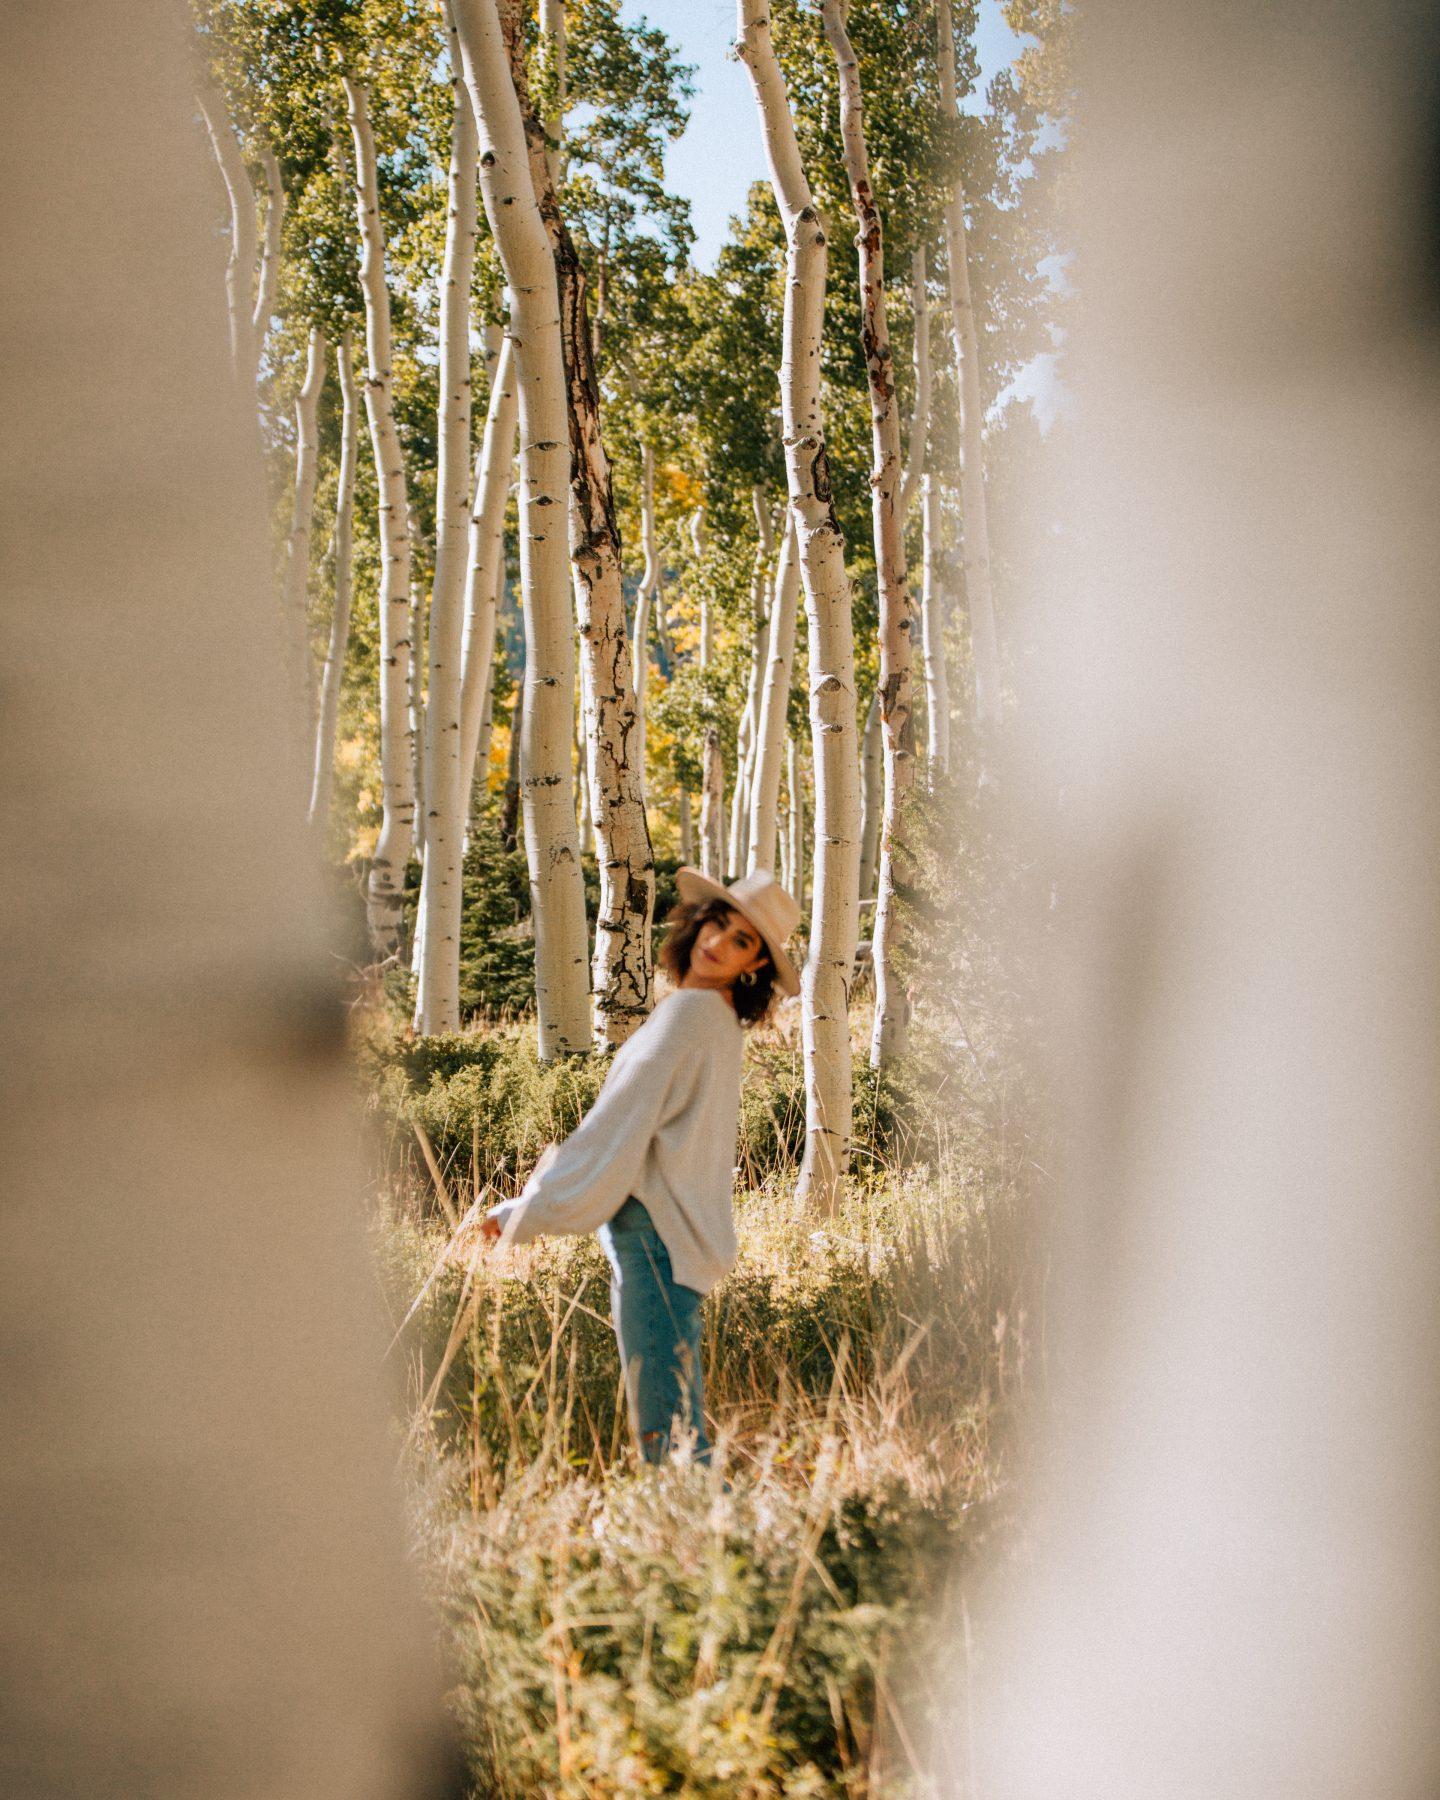 The Fishlake National Forest Pando aspen grove in Utah